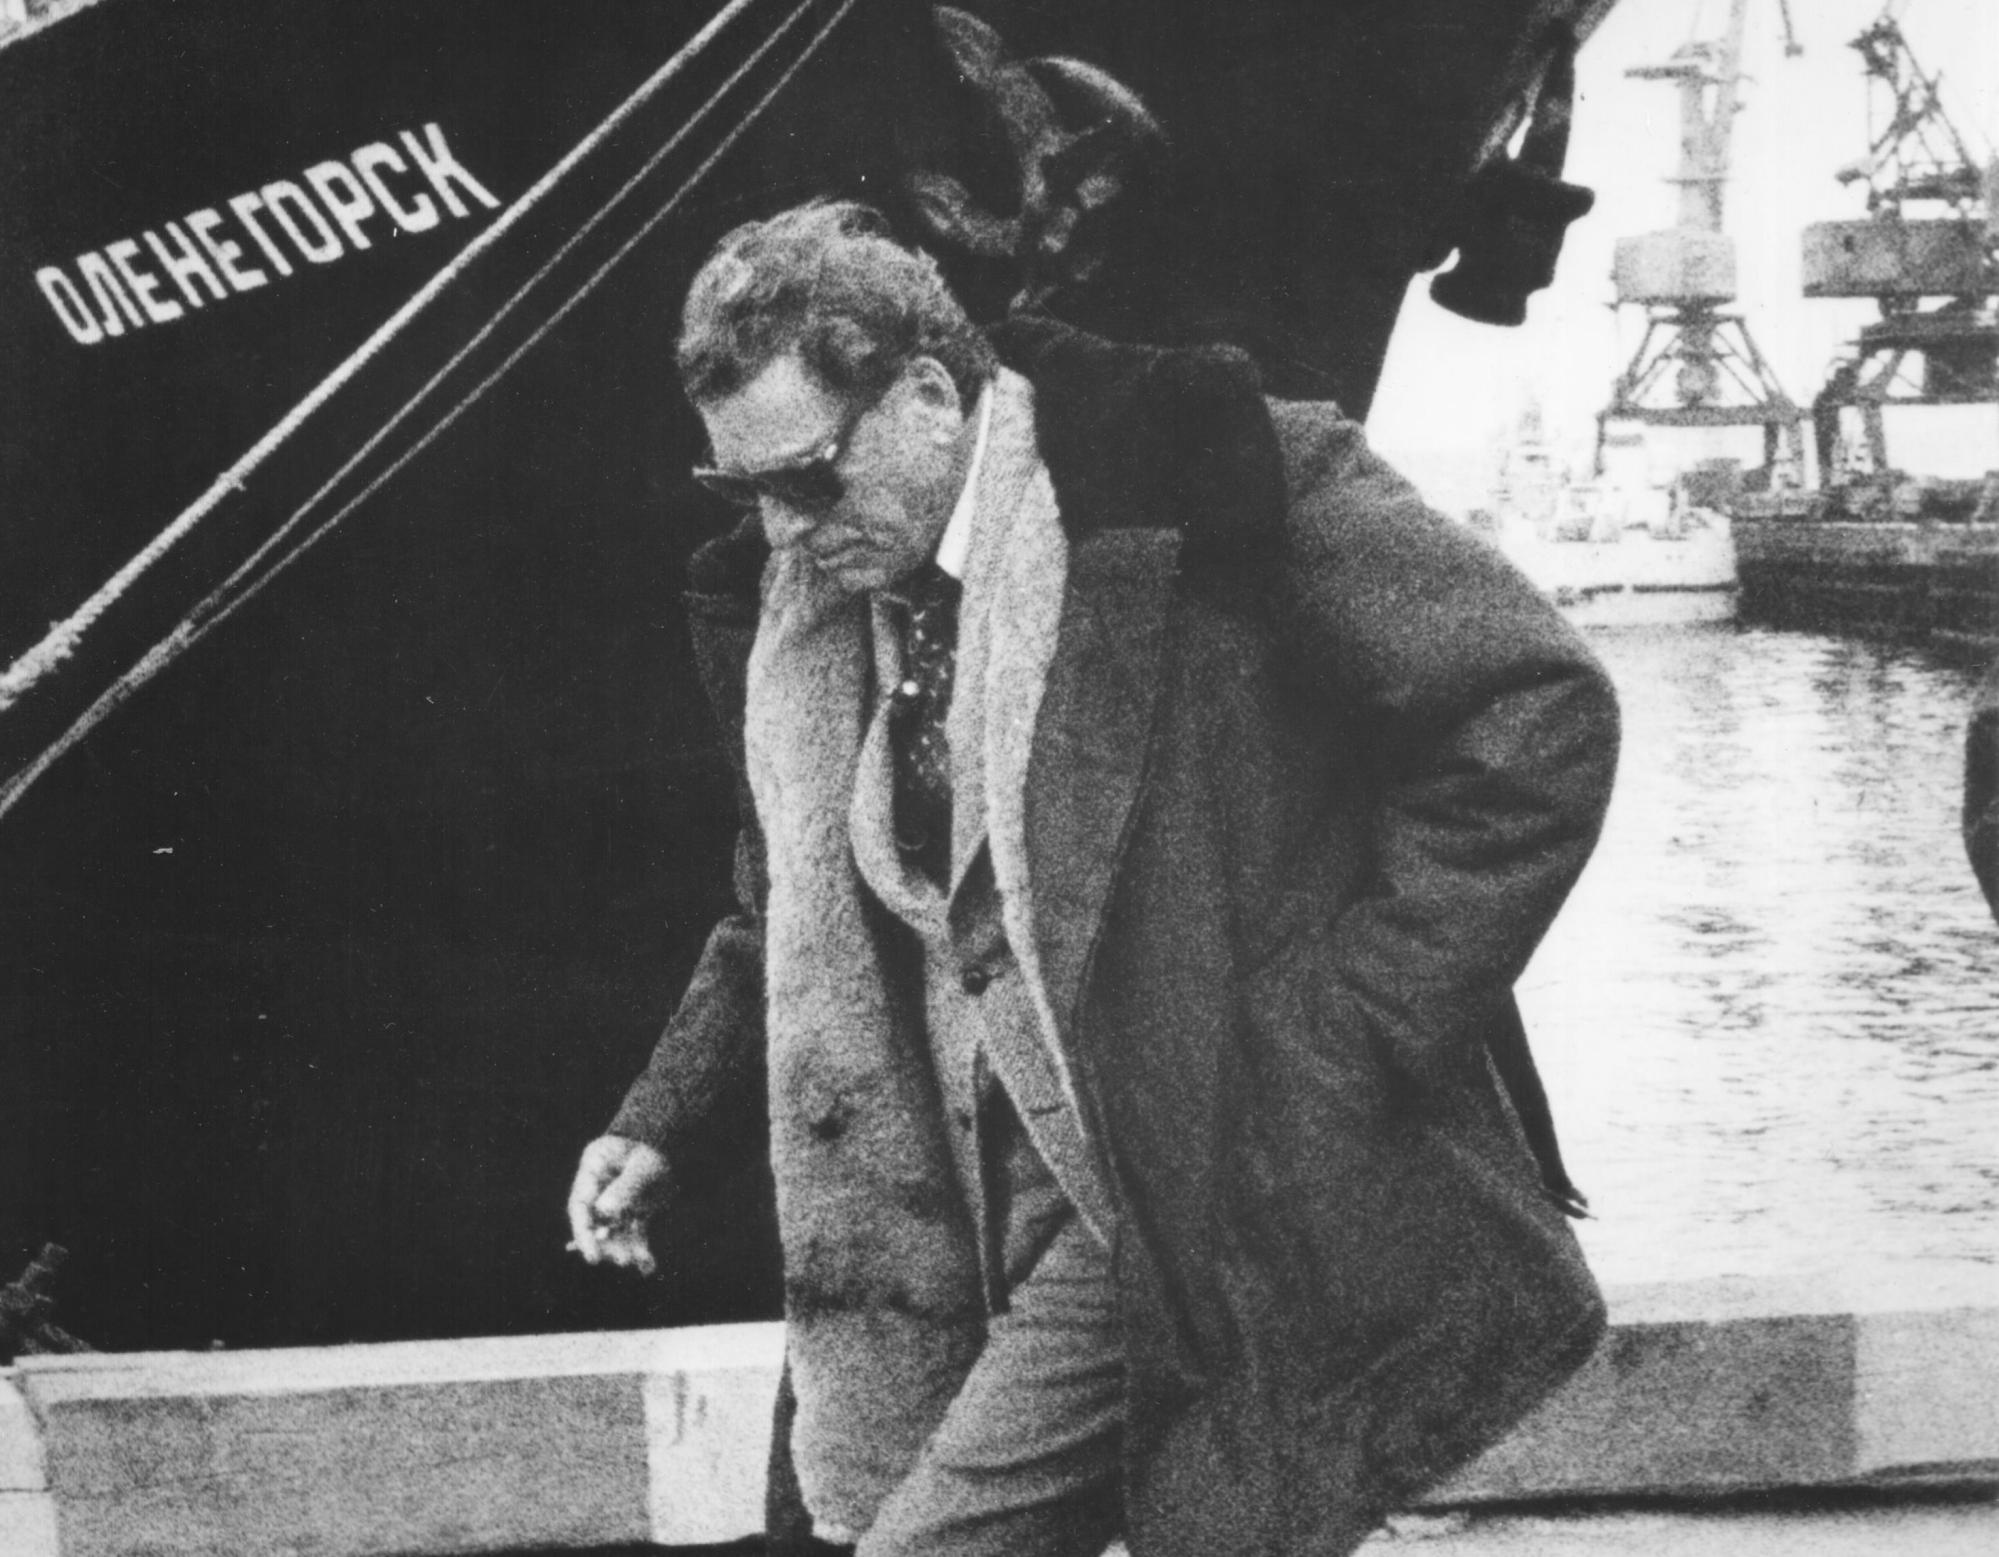 Burt Lancaster at the dock area at Murmansk...